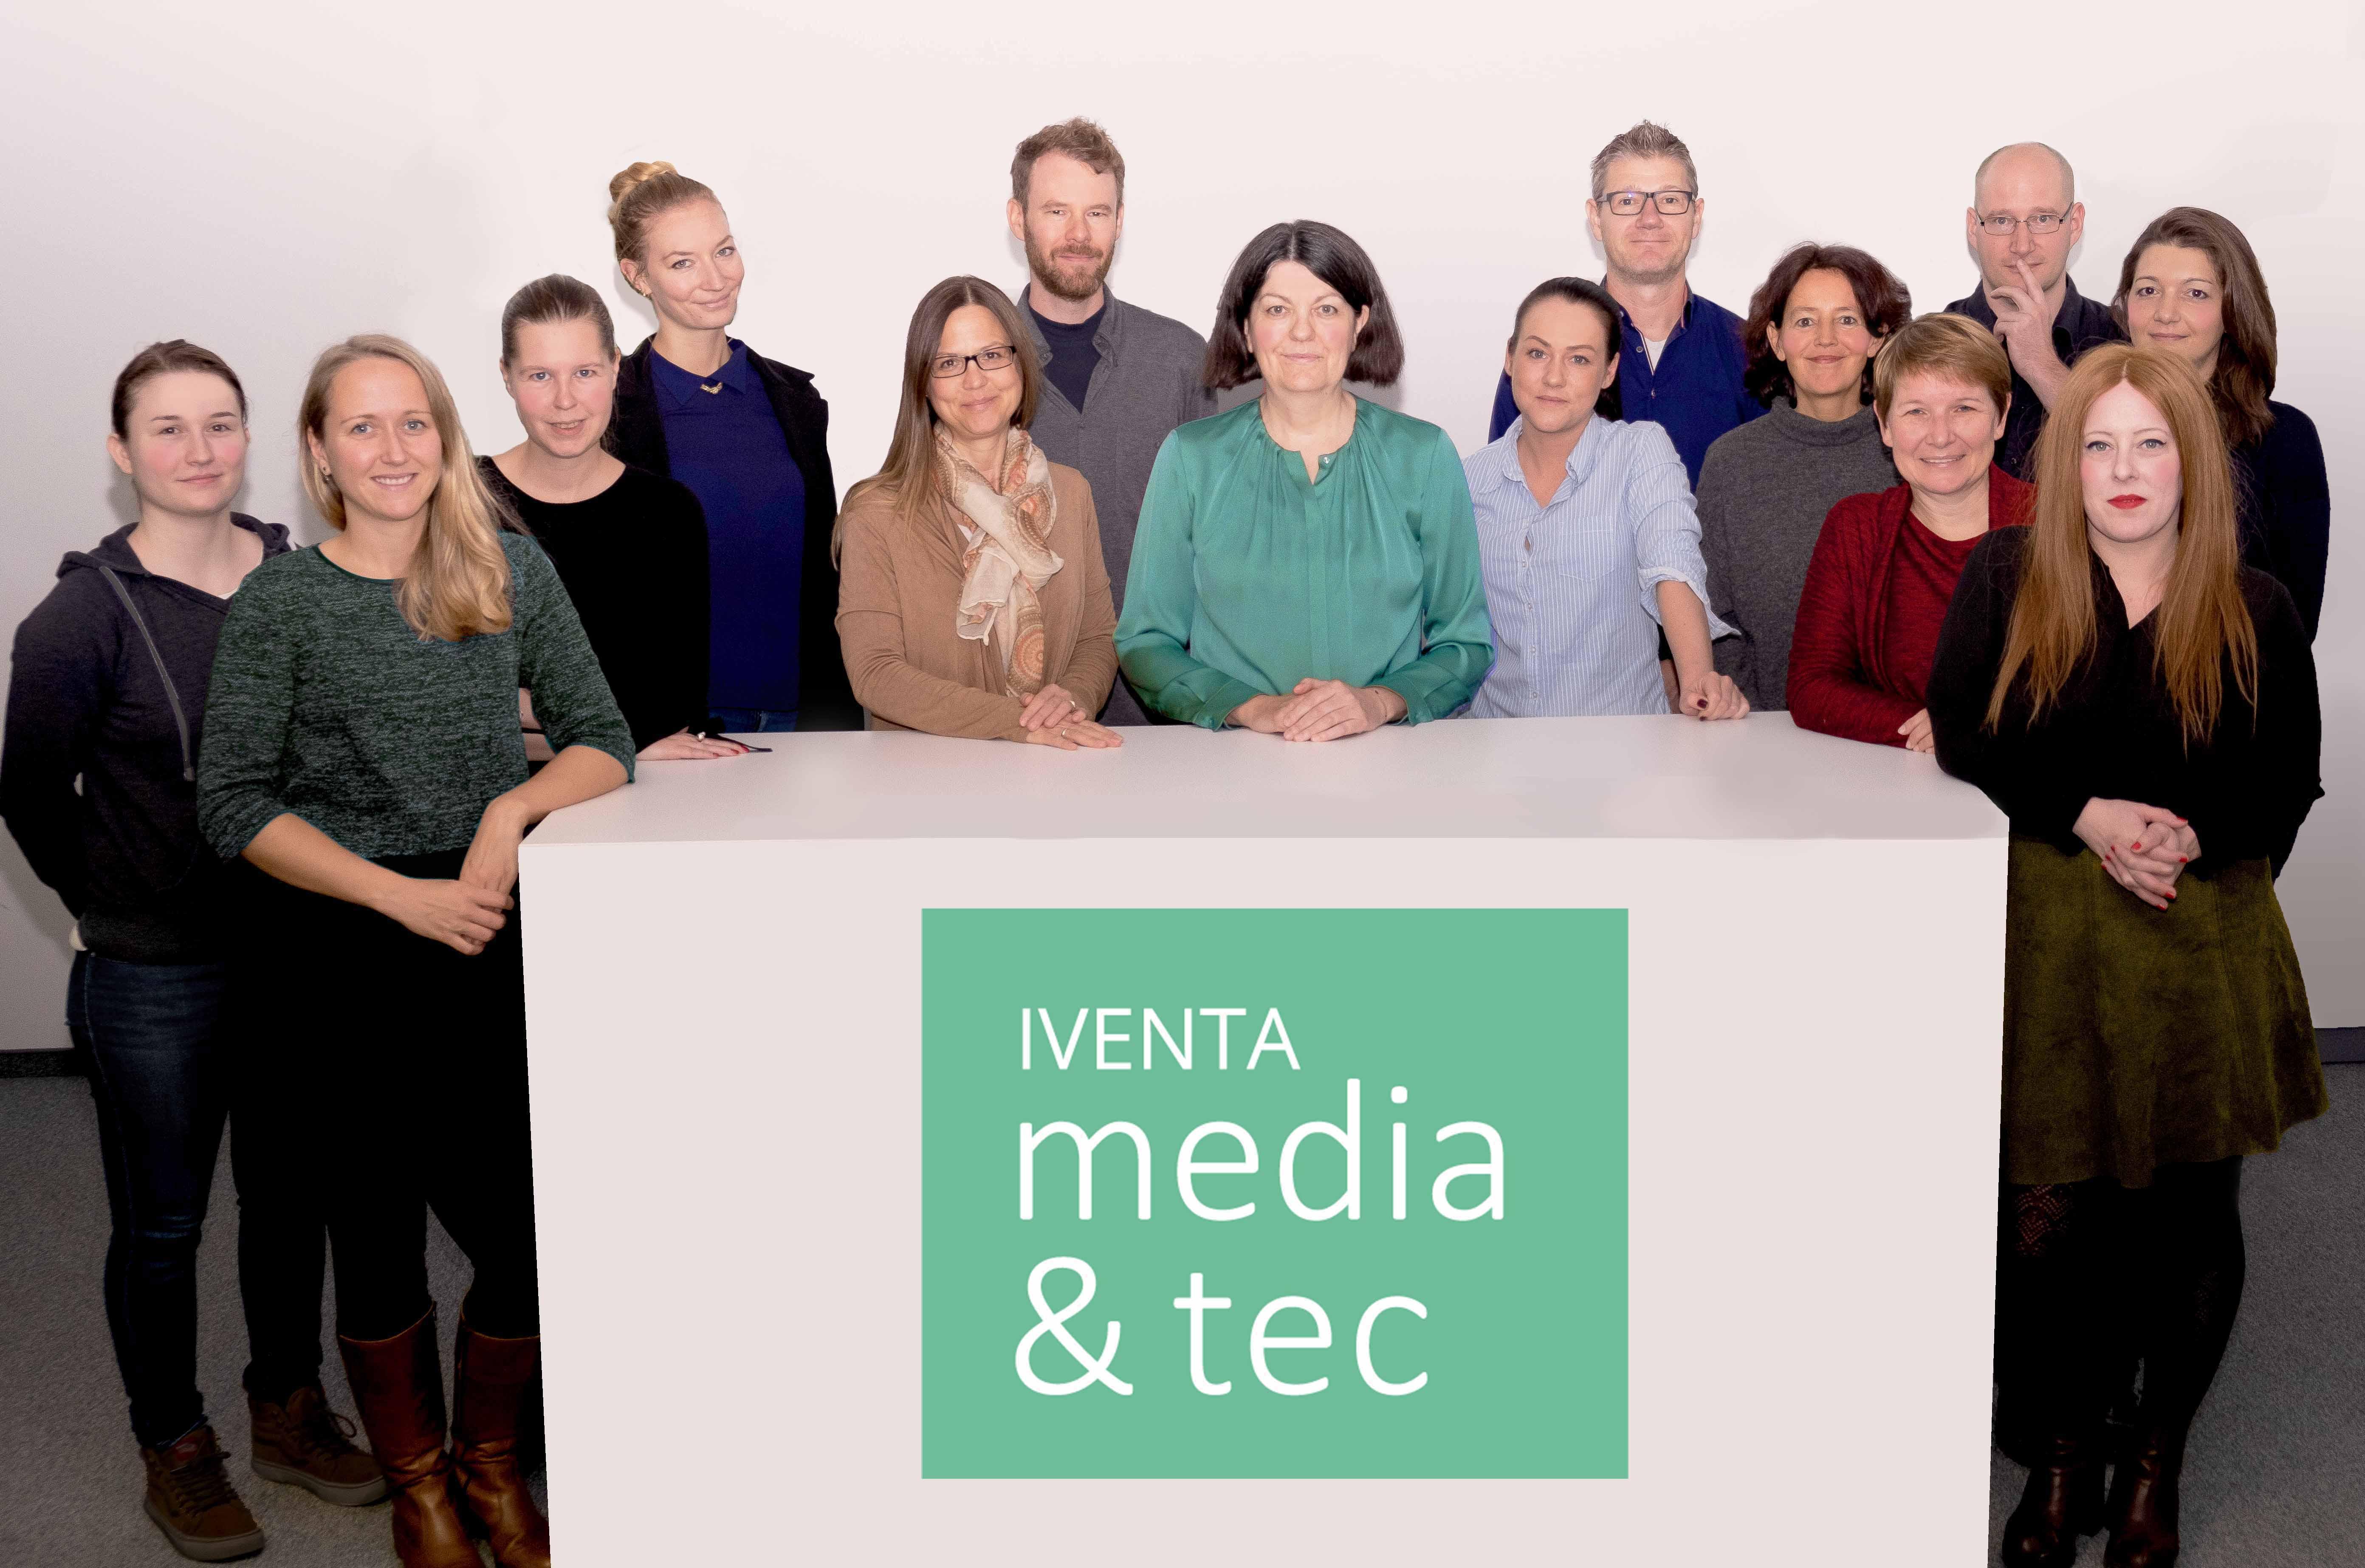 Iventa Media & Tec Team